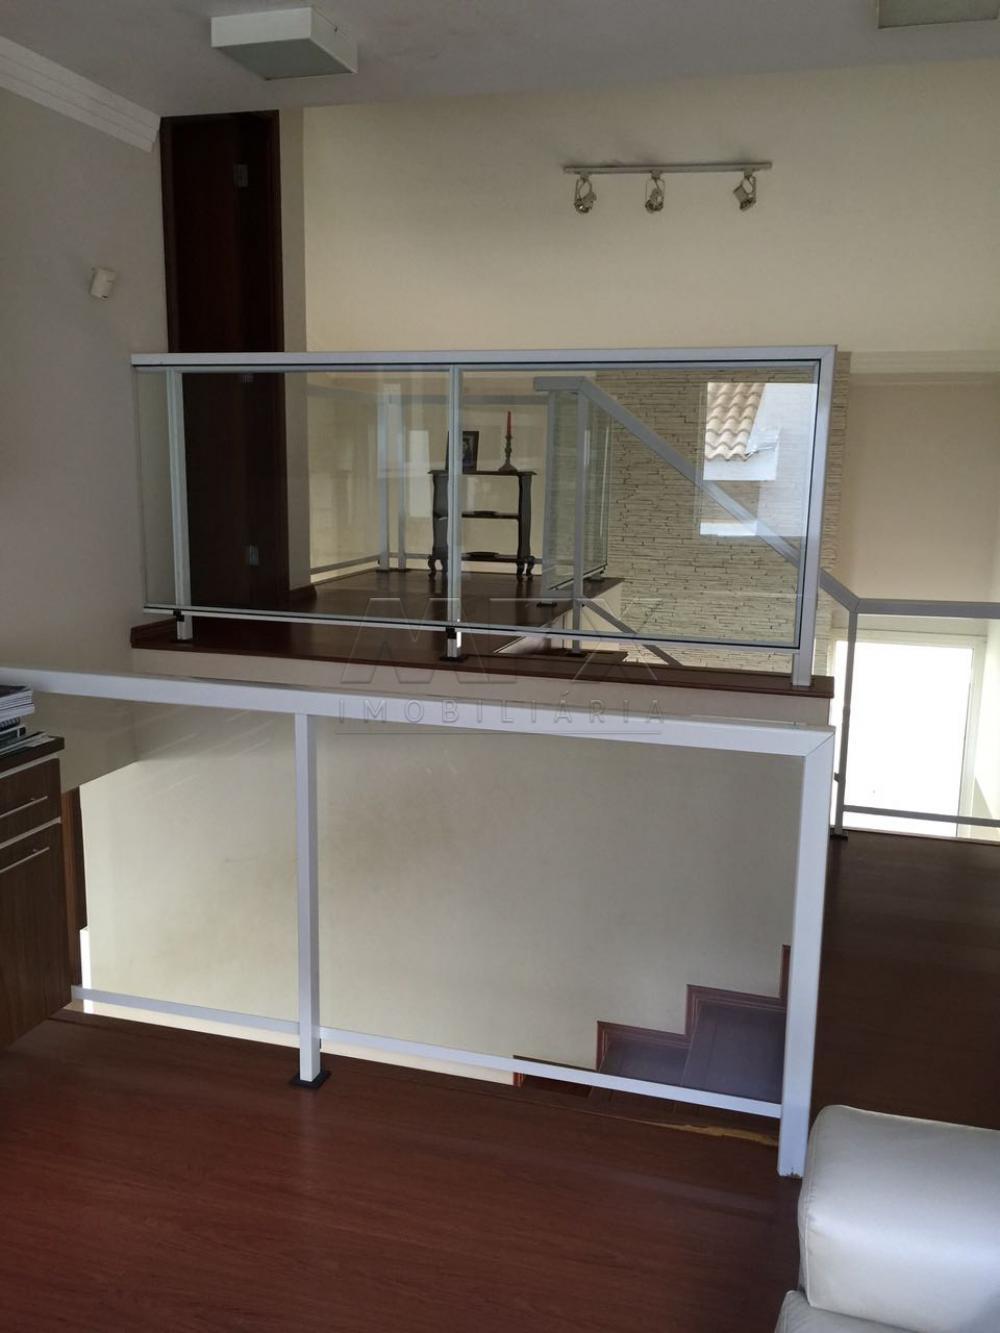 Alugar Casa / Condomínio em Bauru R$ 7.000,00 - Foto 16